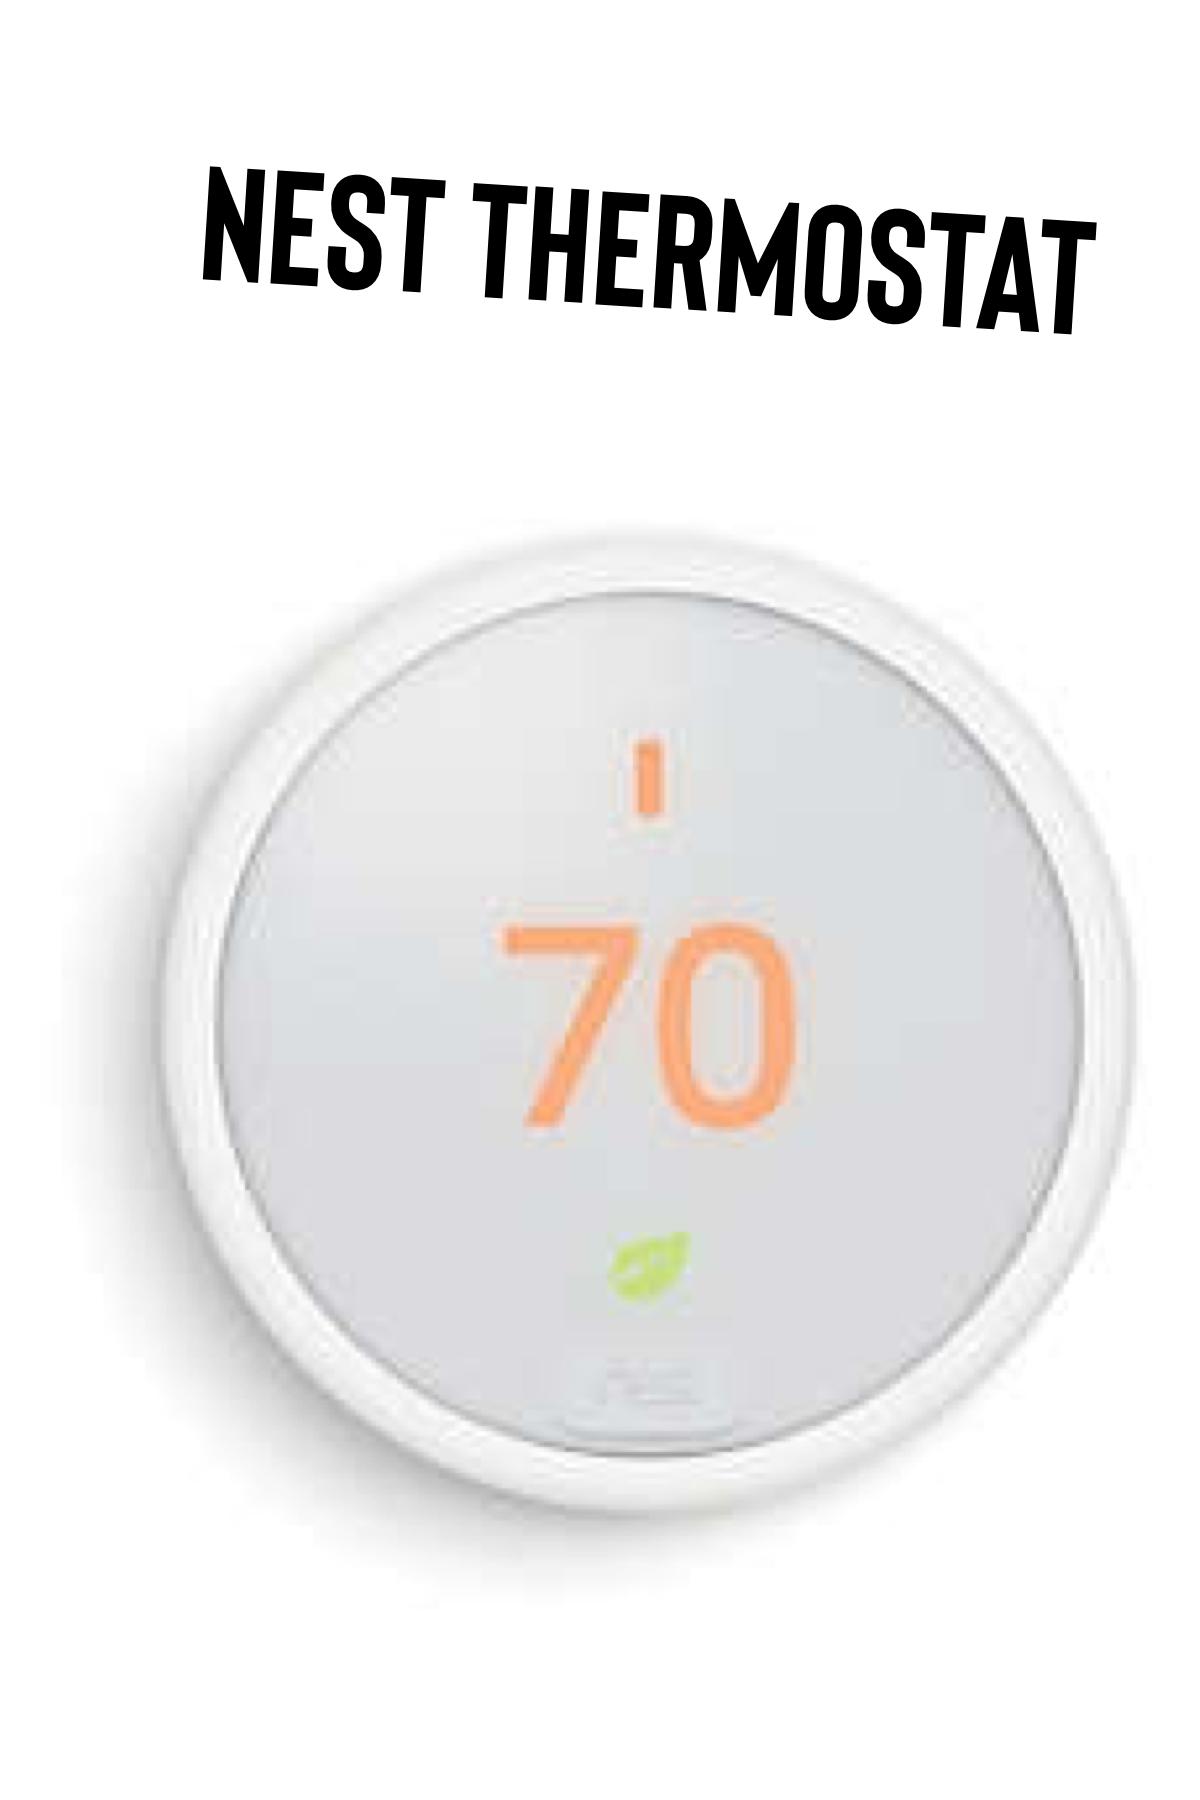 Google Nest Thermostat E In White Bed Bath Beyond Google Nest Thermostat Google Nest Nest Thermostat